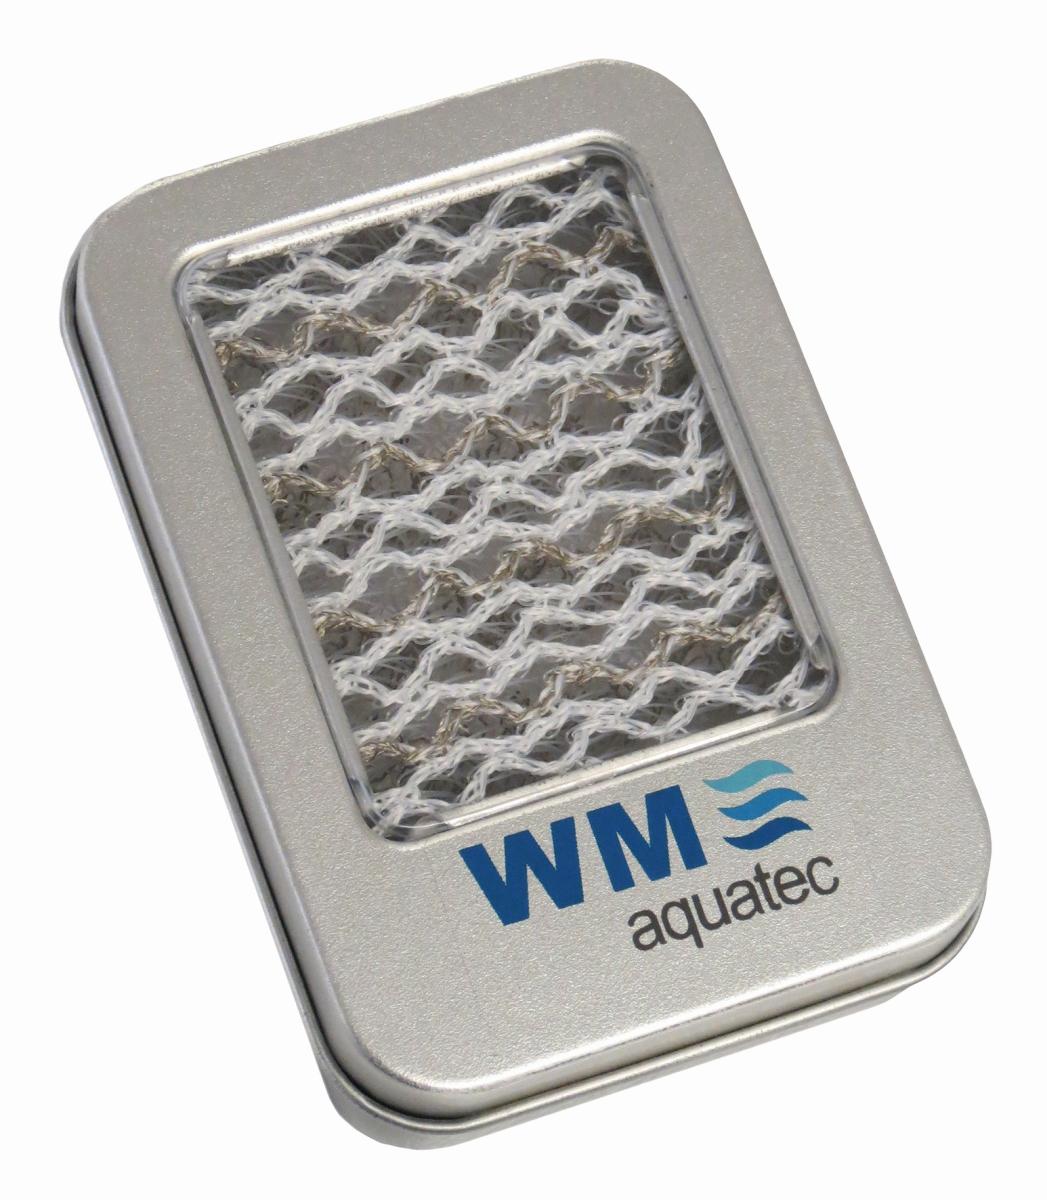 WM aquatec SilberNetz